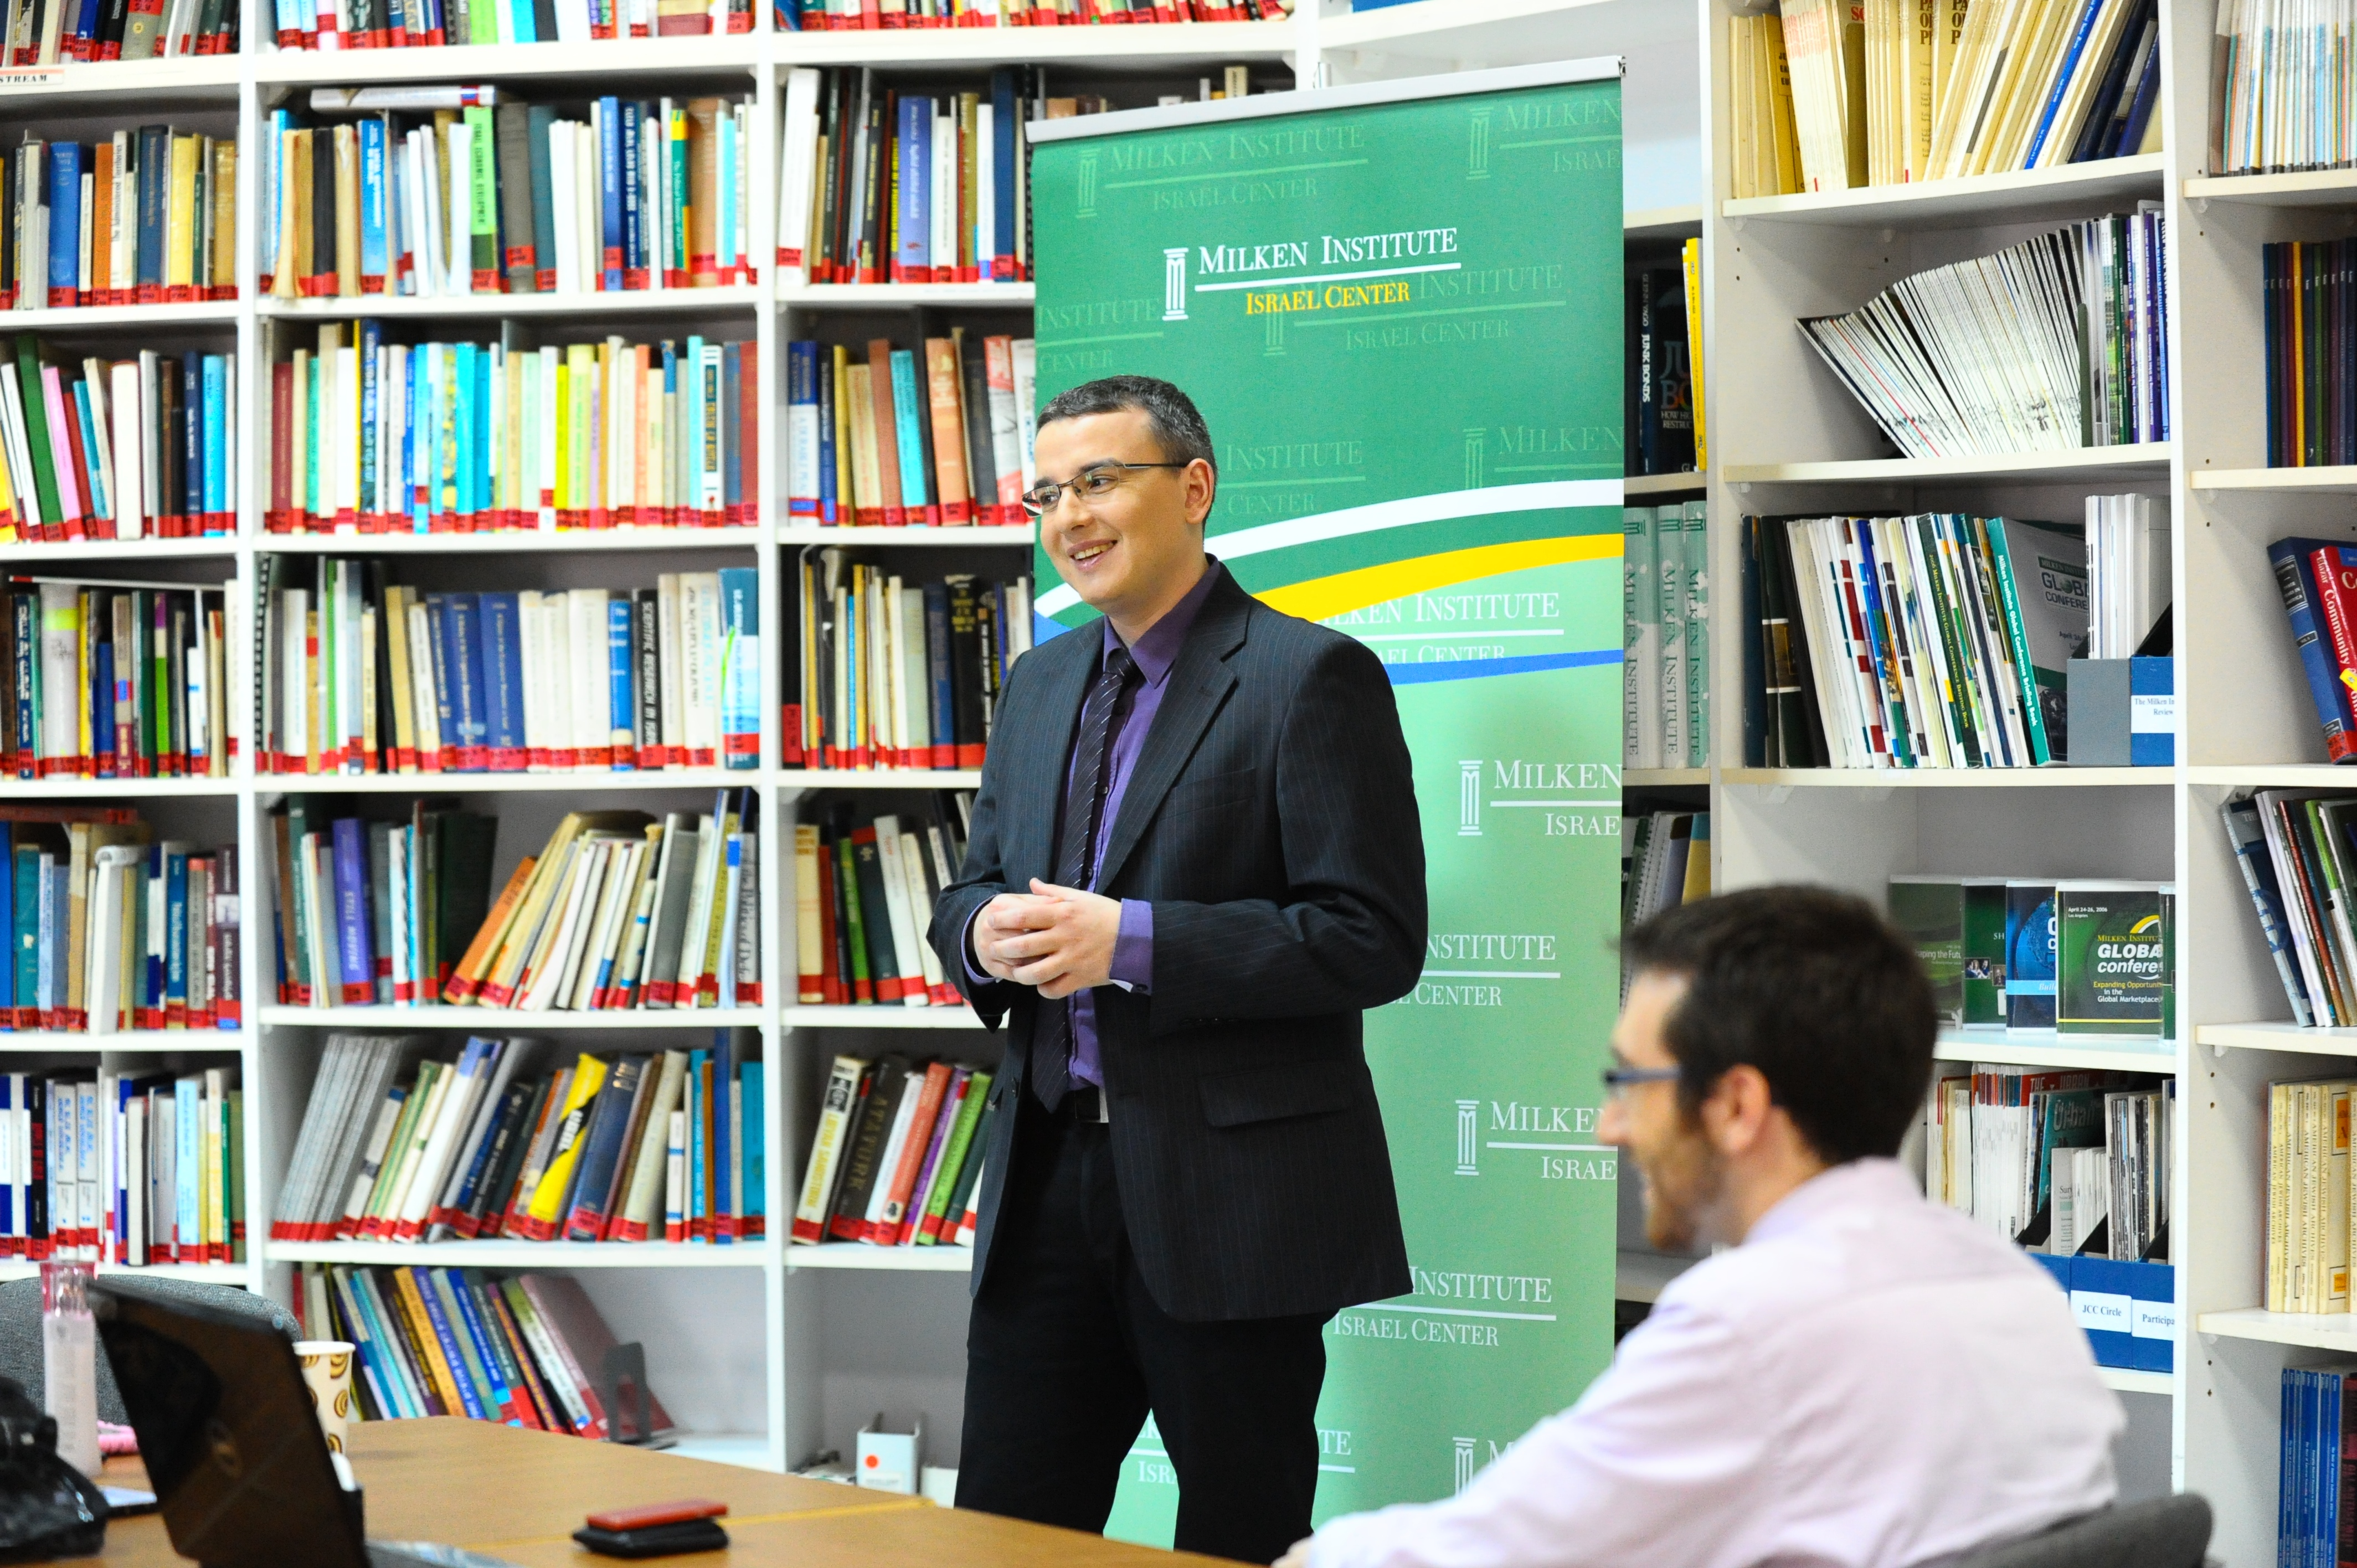 STAS SOKOLINSKI, CLASS OF 2010-2011